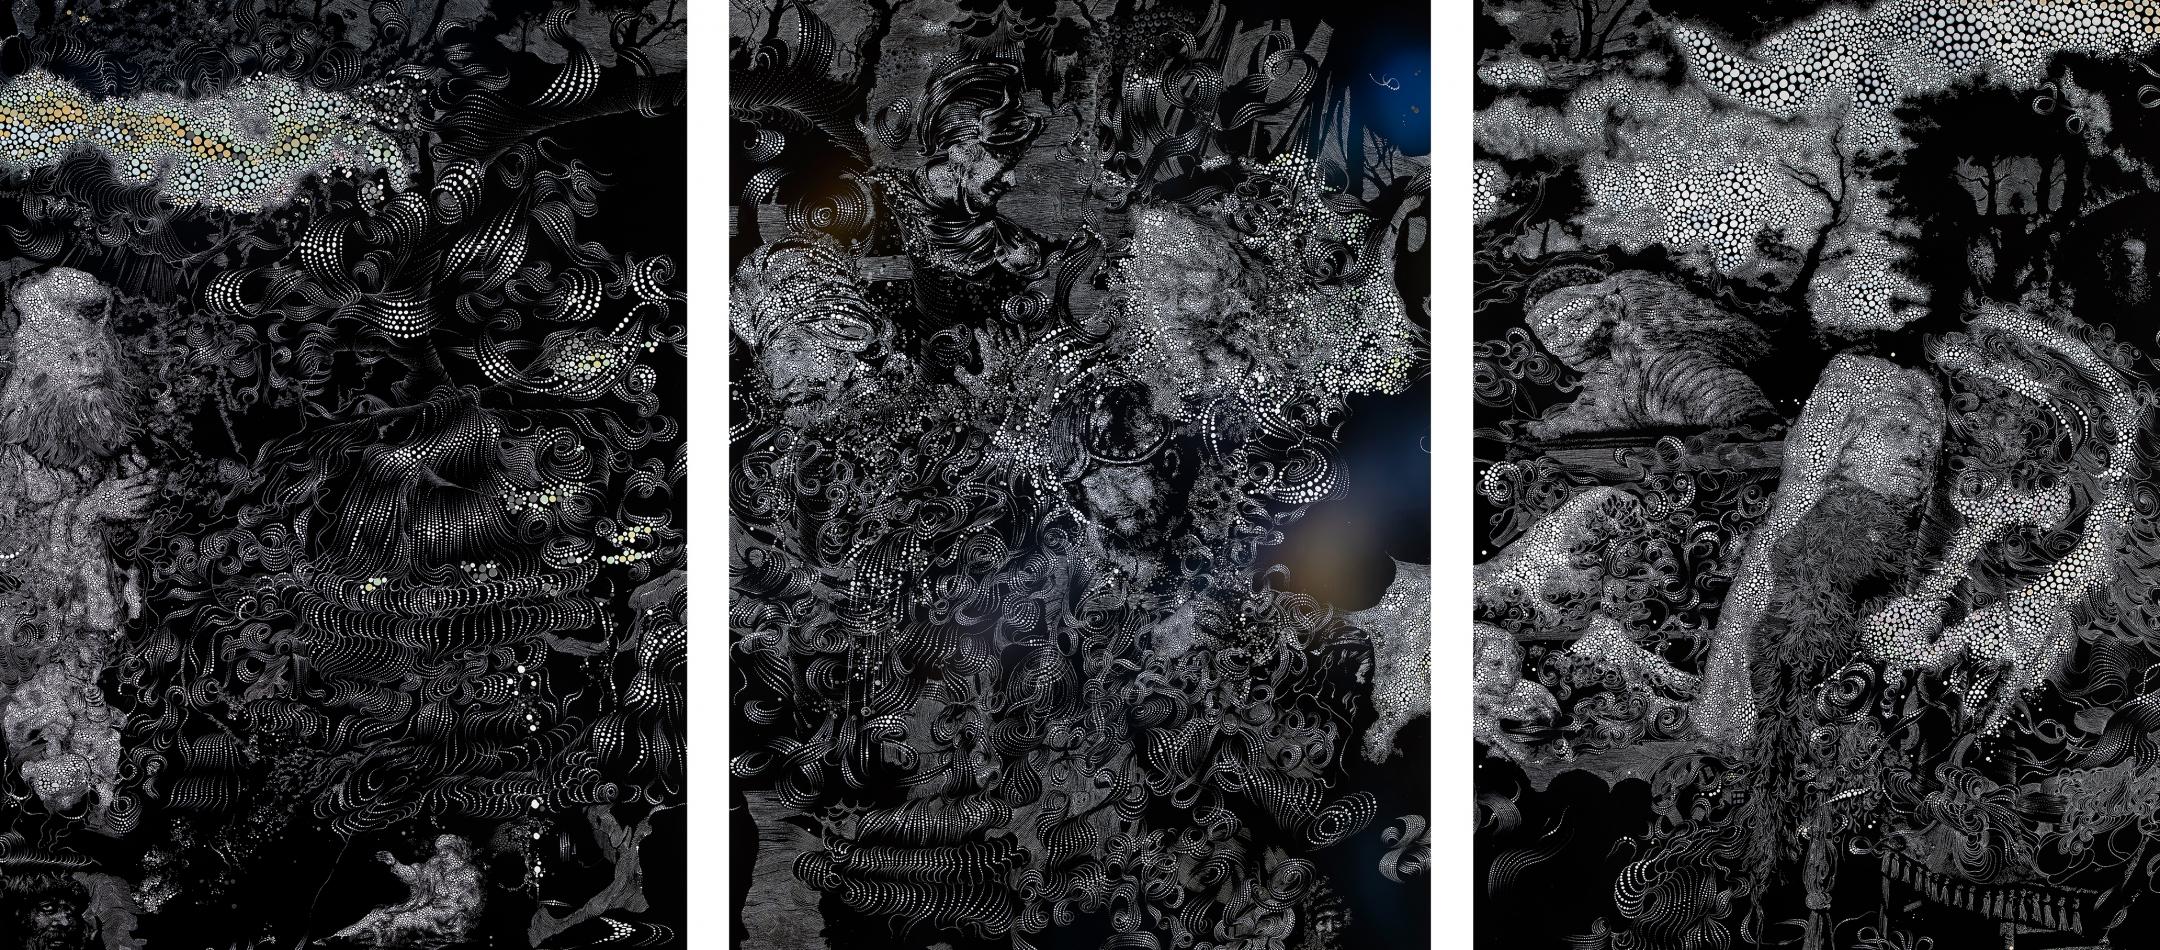 Sebastiaan Bremer: Nocturne